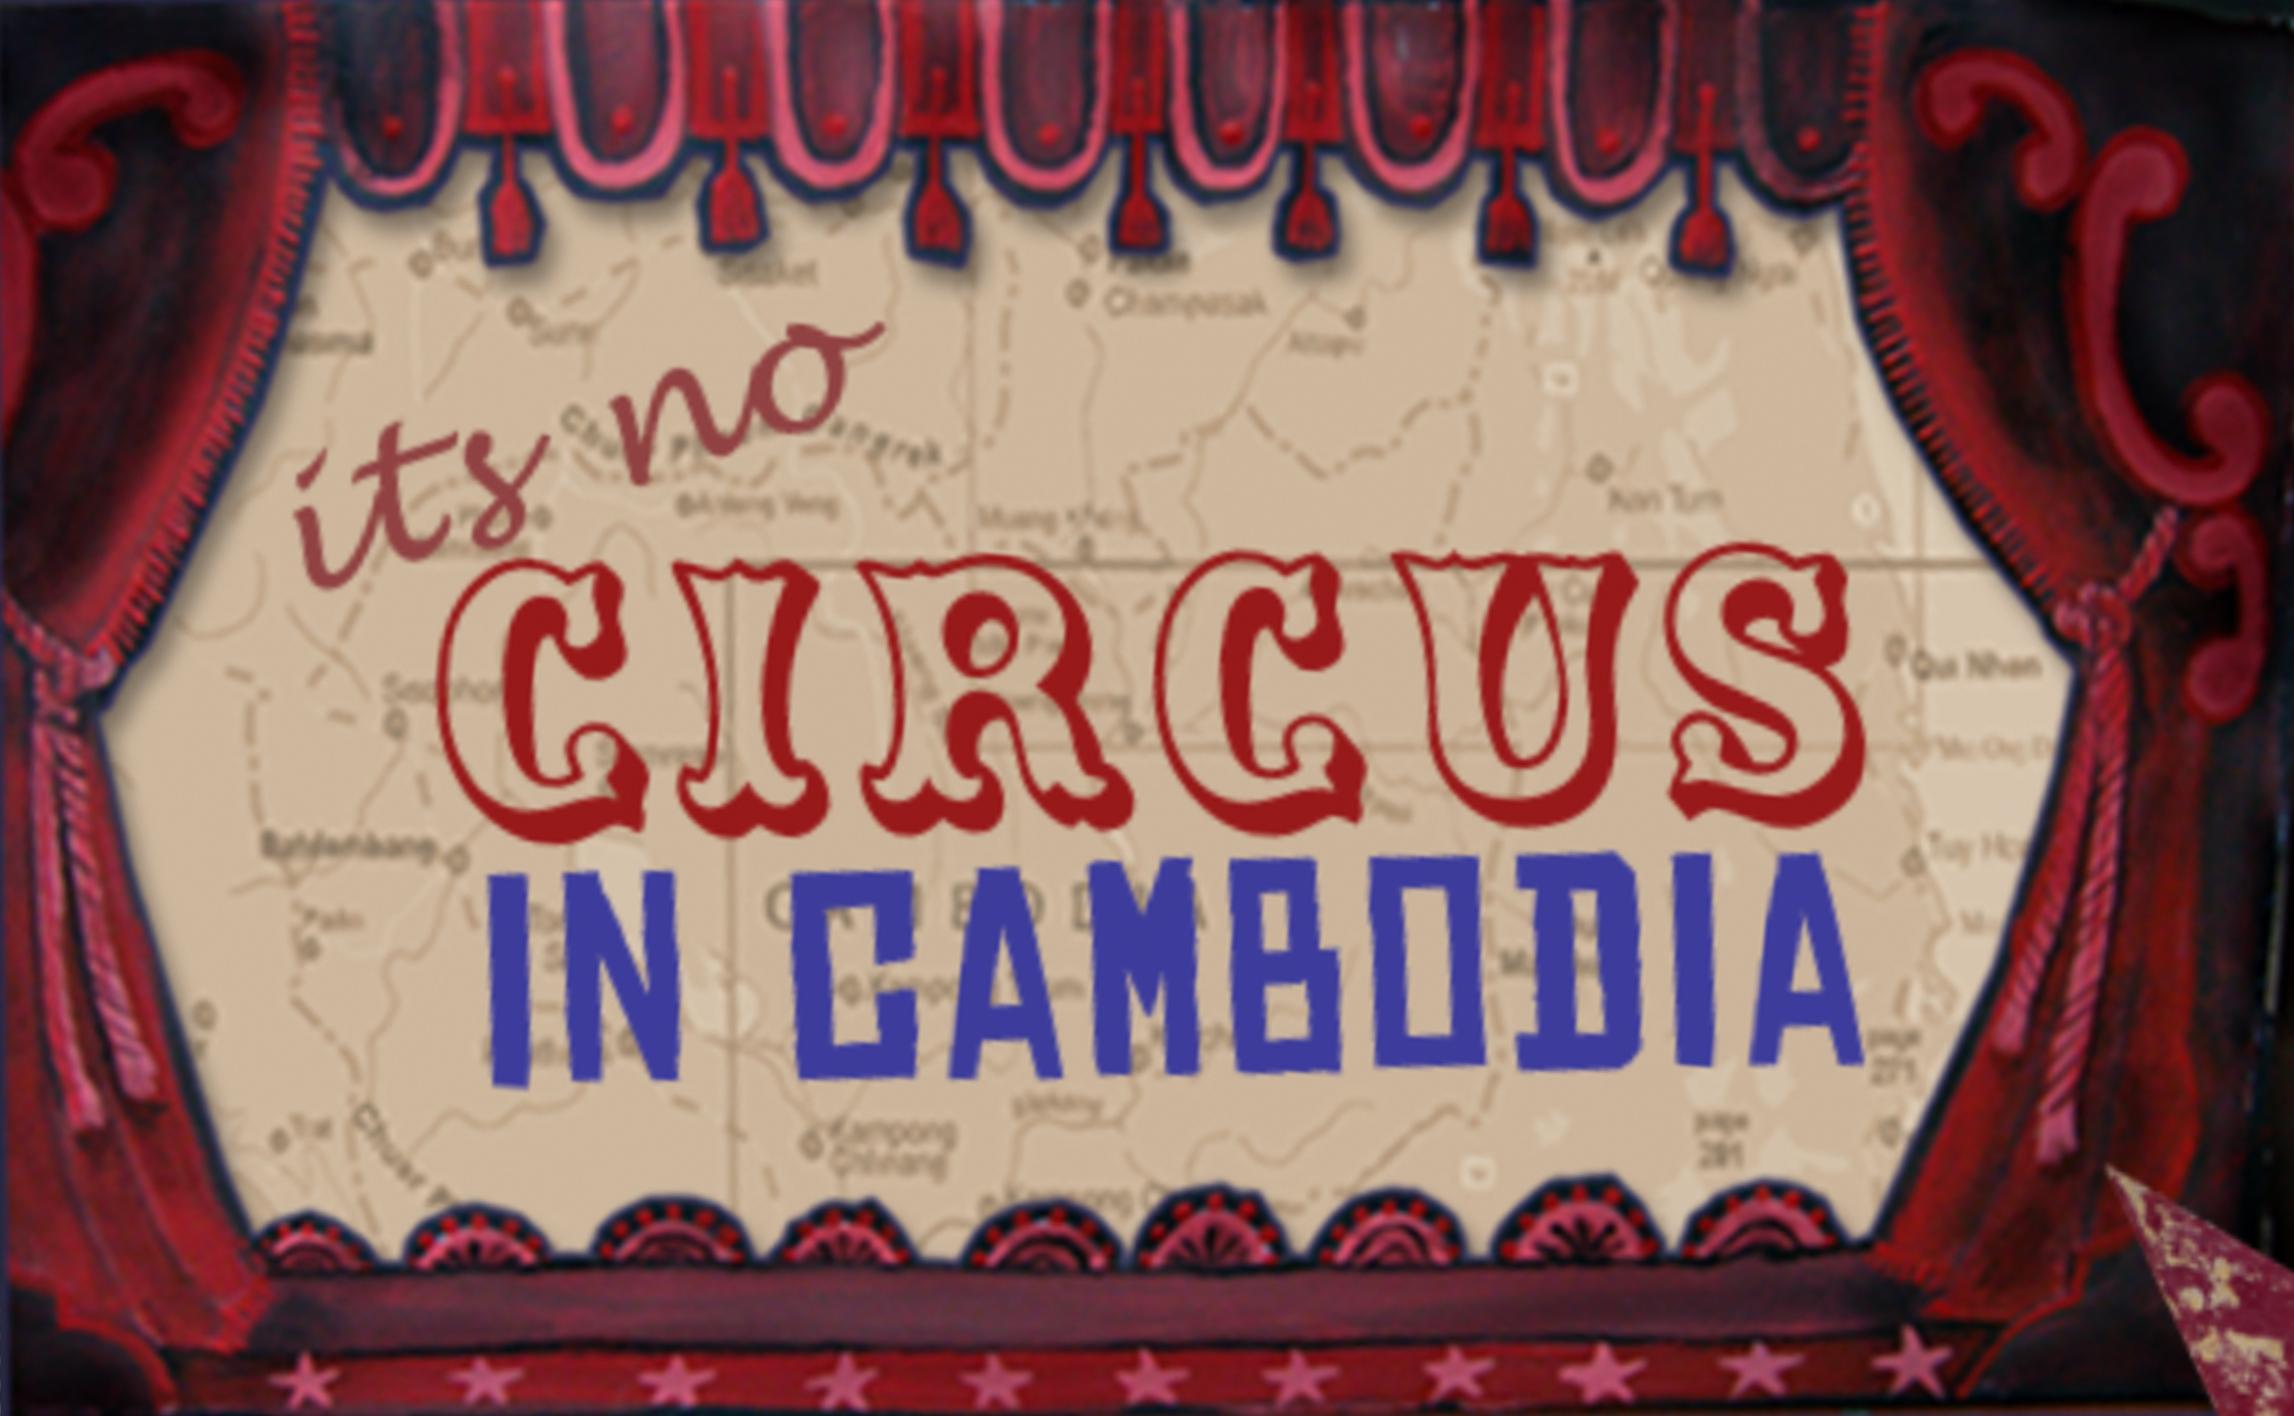 circus graphic.jpg